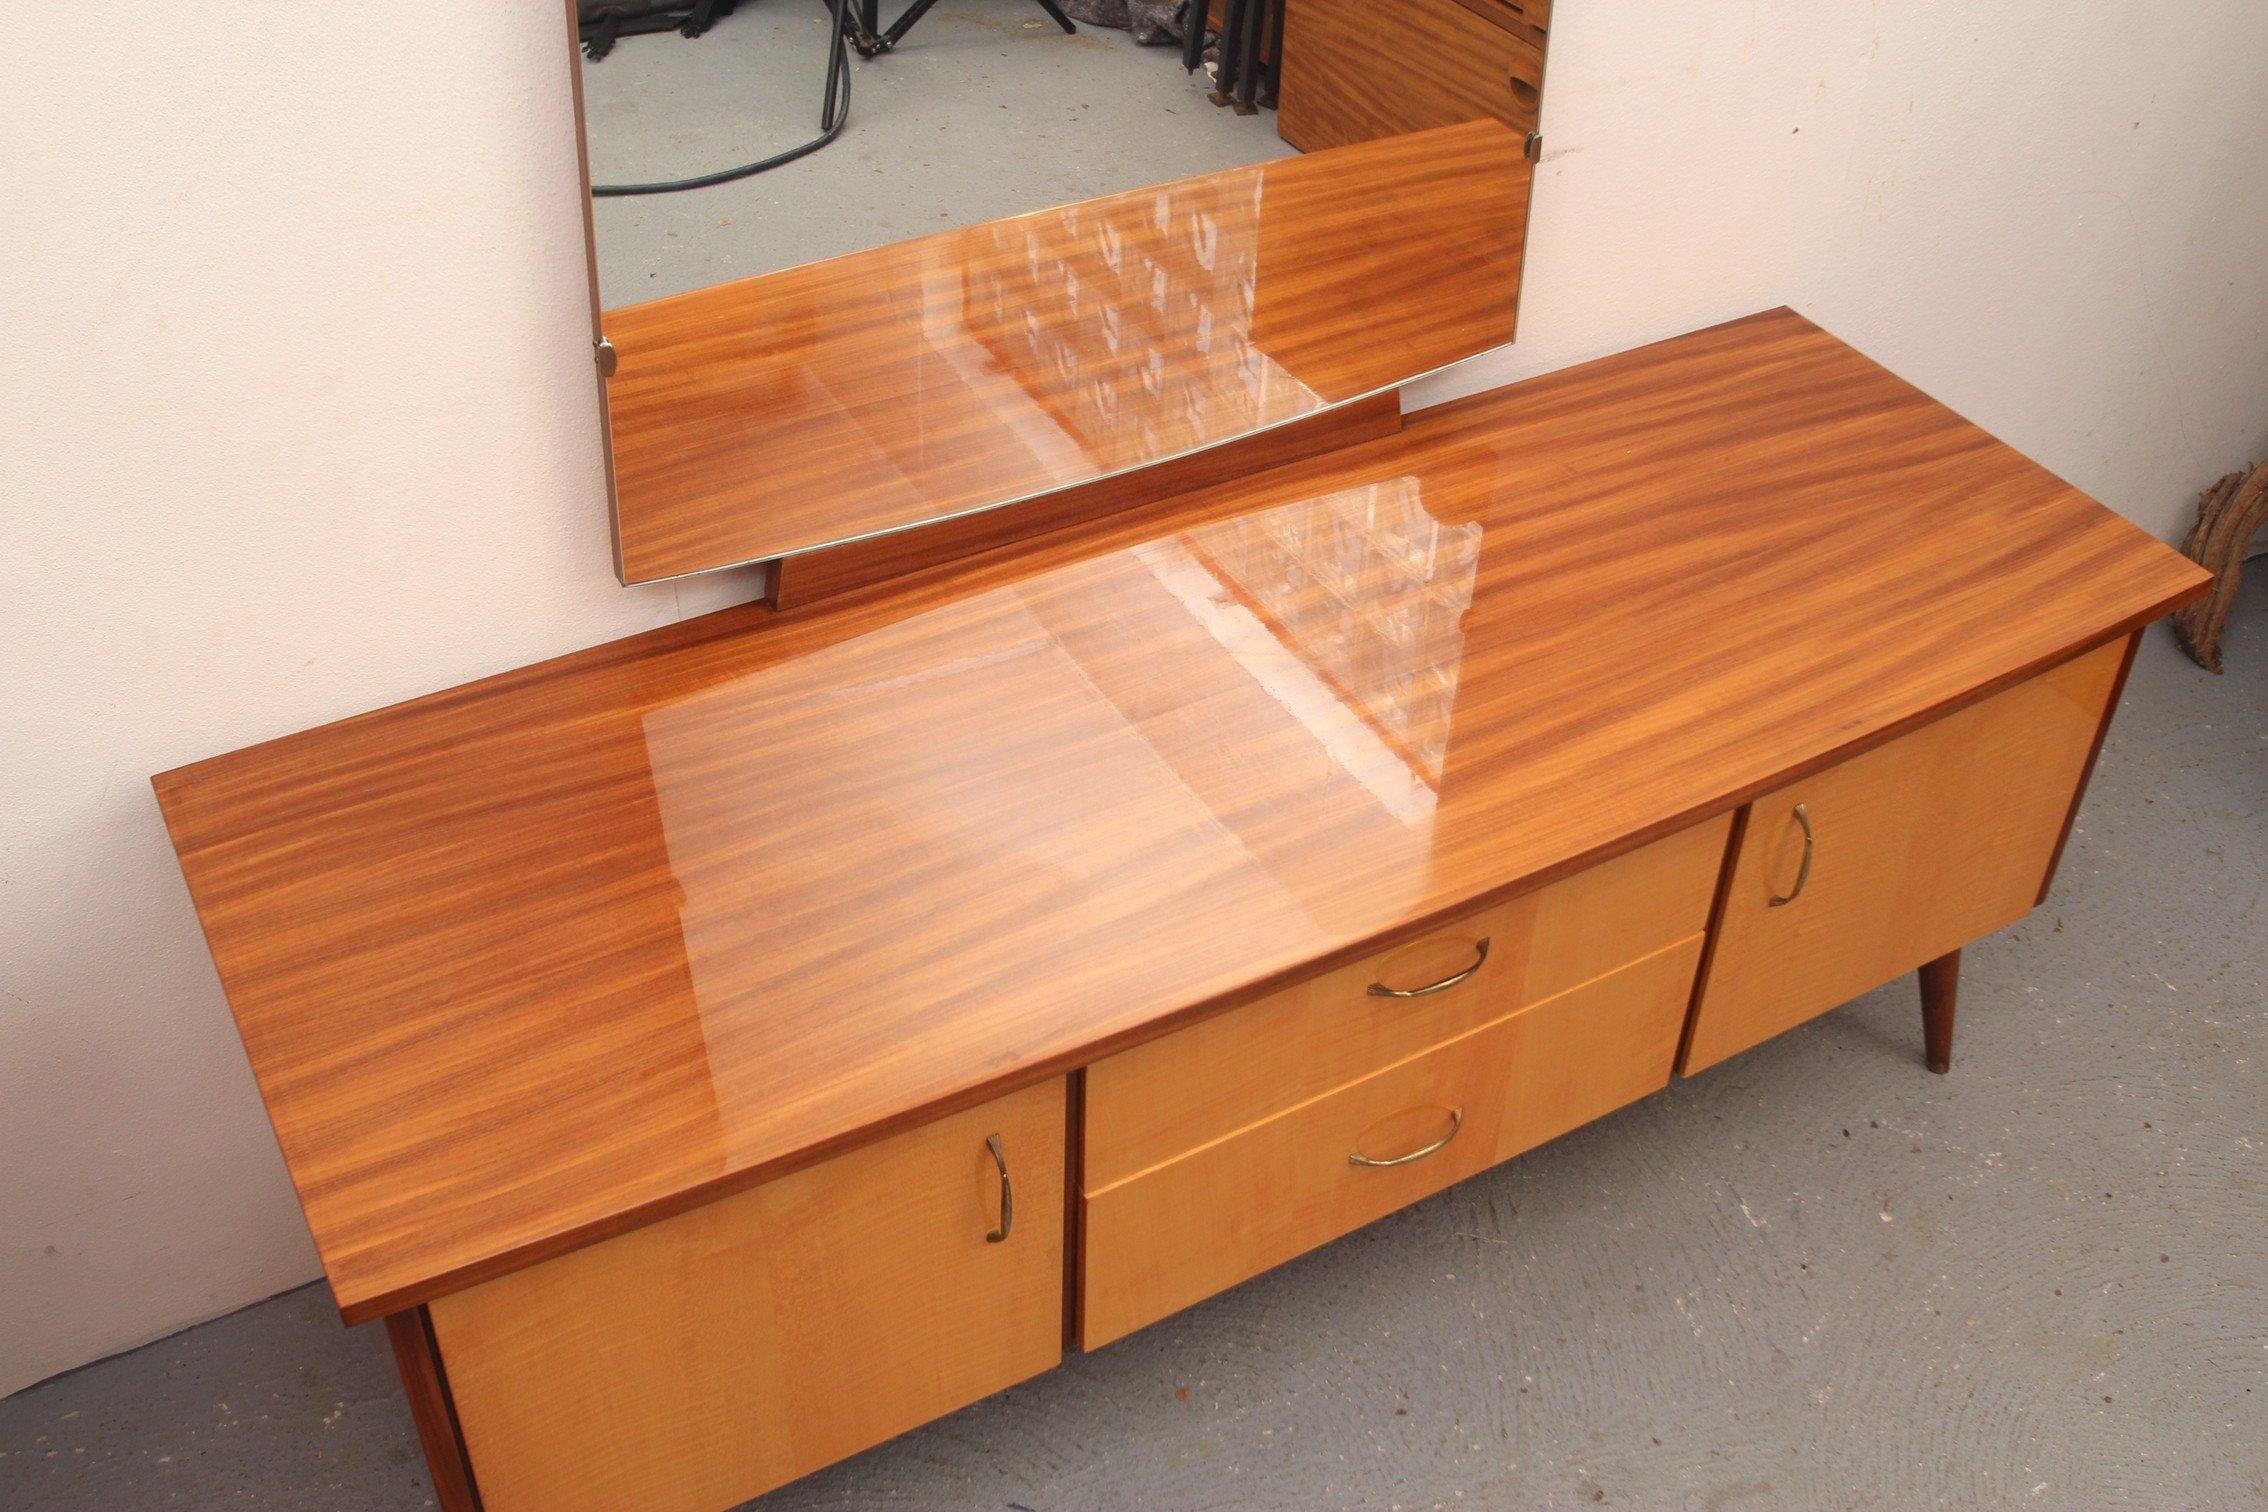 Dressing table in veneered wood with mirror s